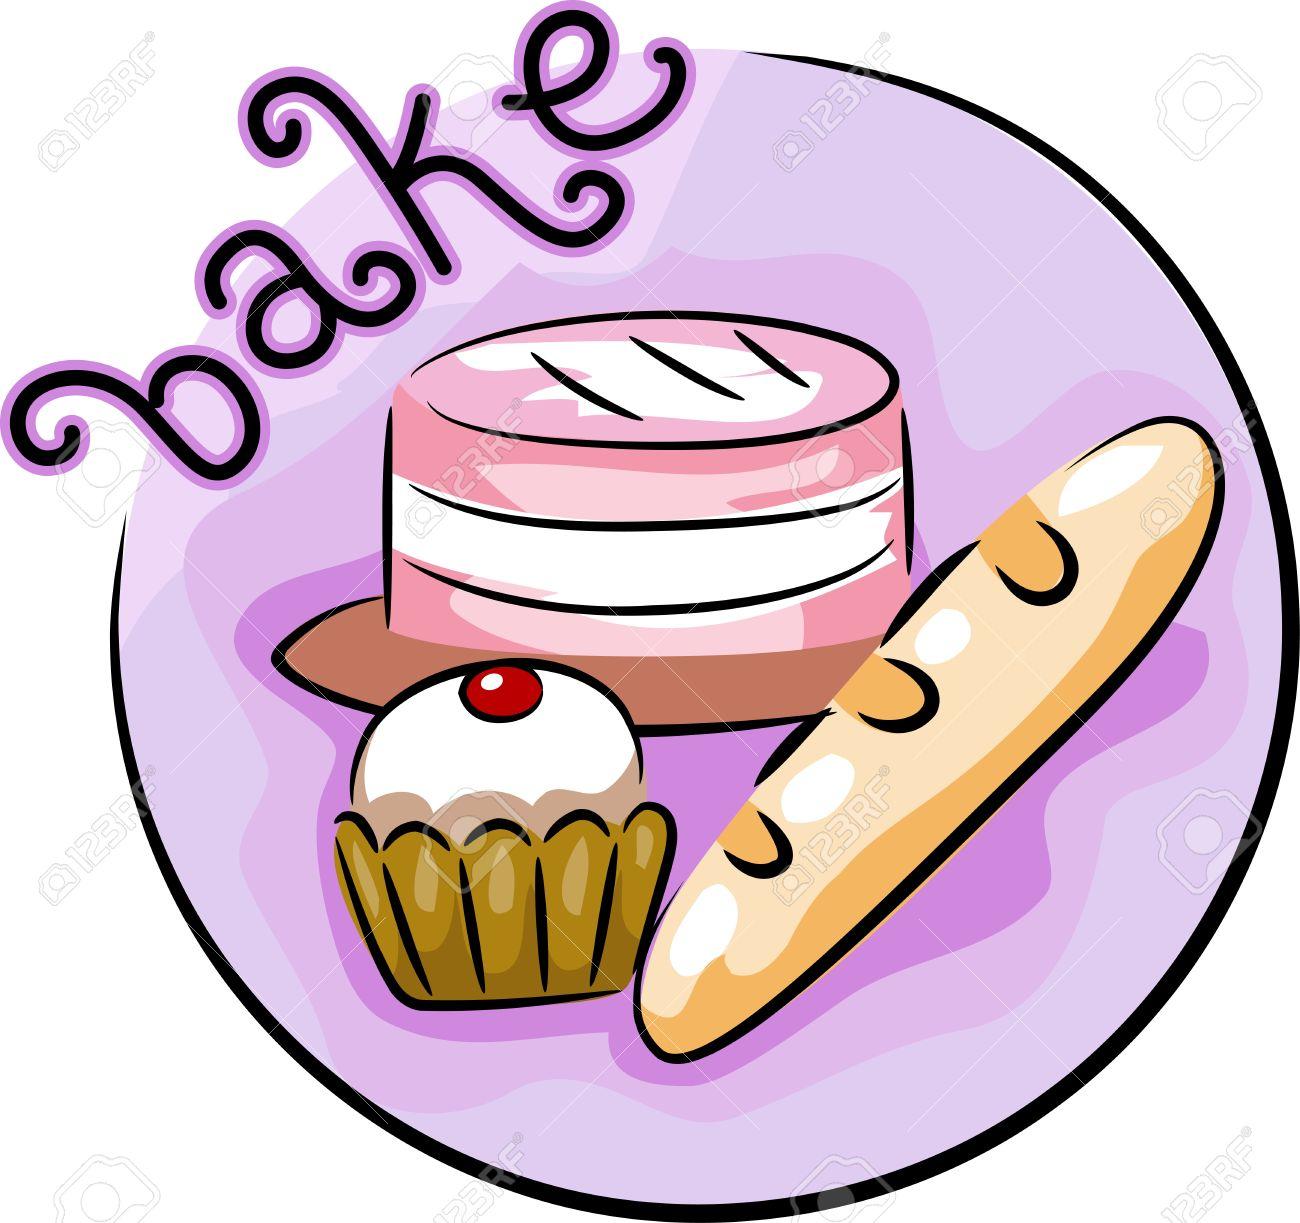 Bake clipart jpg library clipart bake: Illustration of | Clipart Panda - Free Clipart Images jpg library